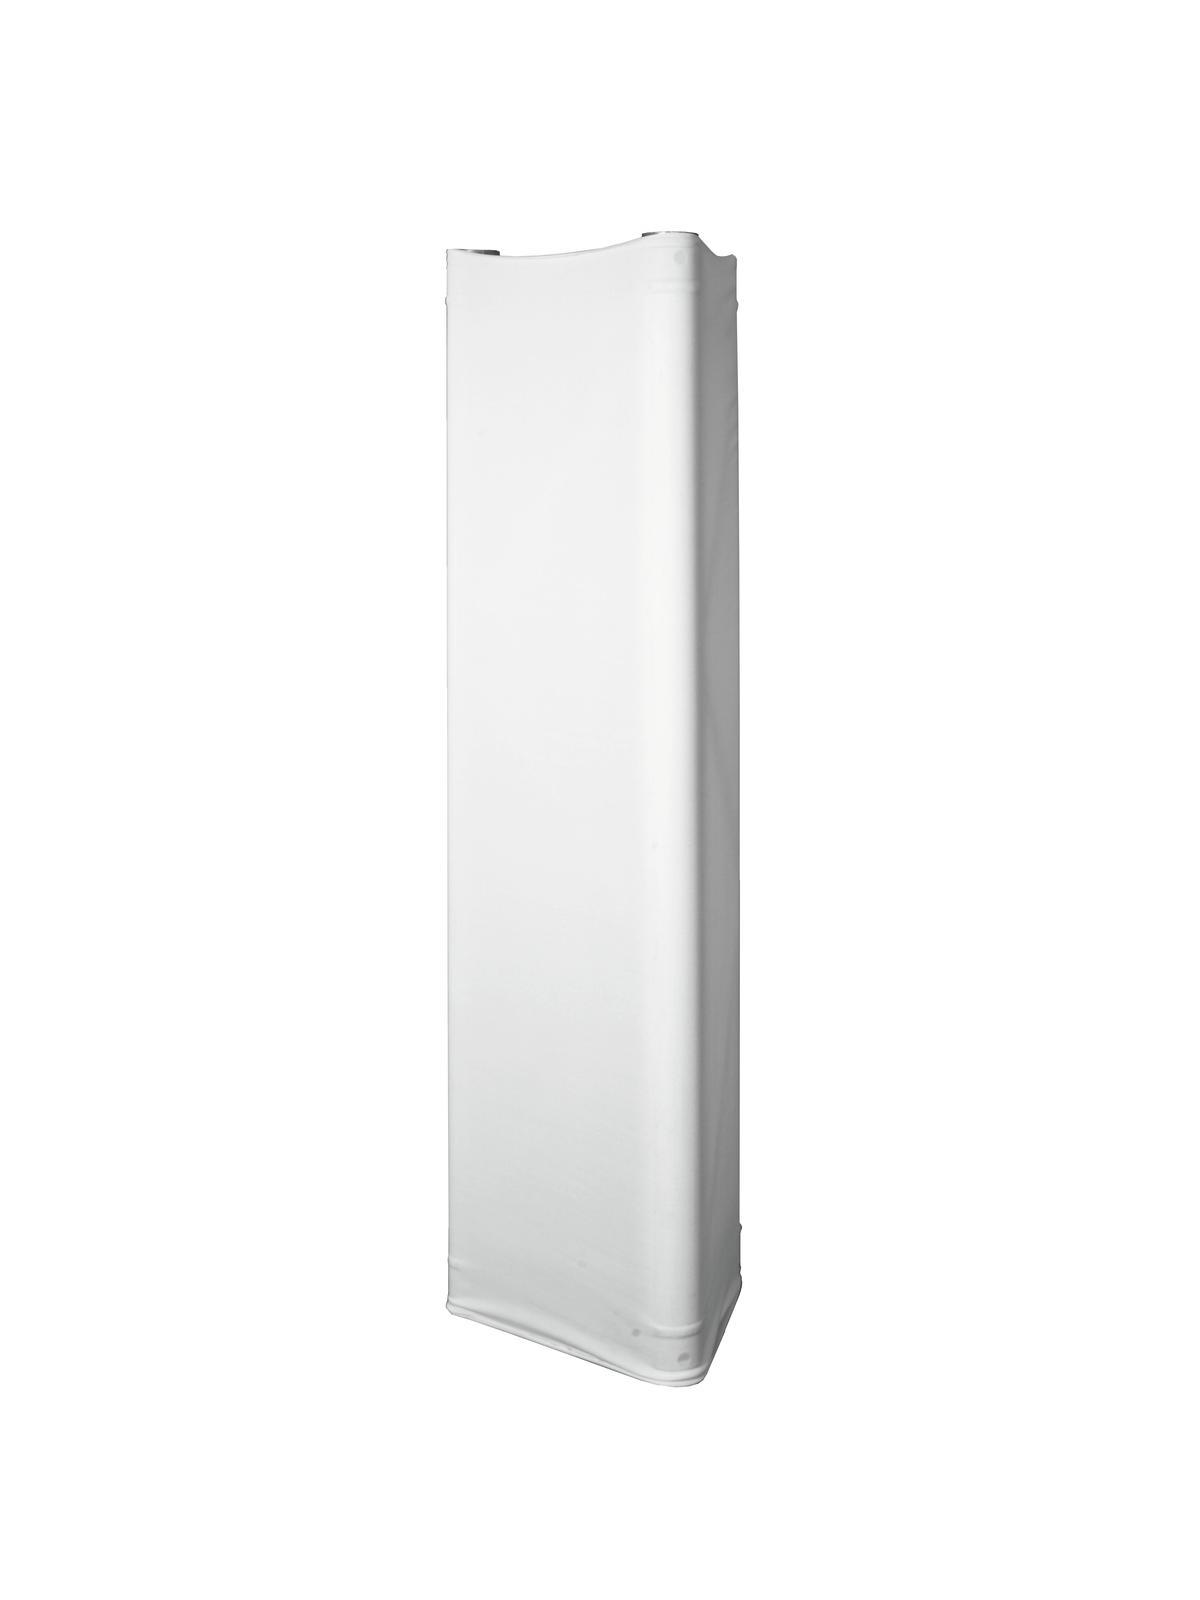 EXPAND BATC1W Trusscover 100cm weiß